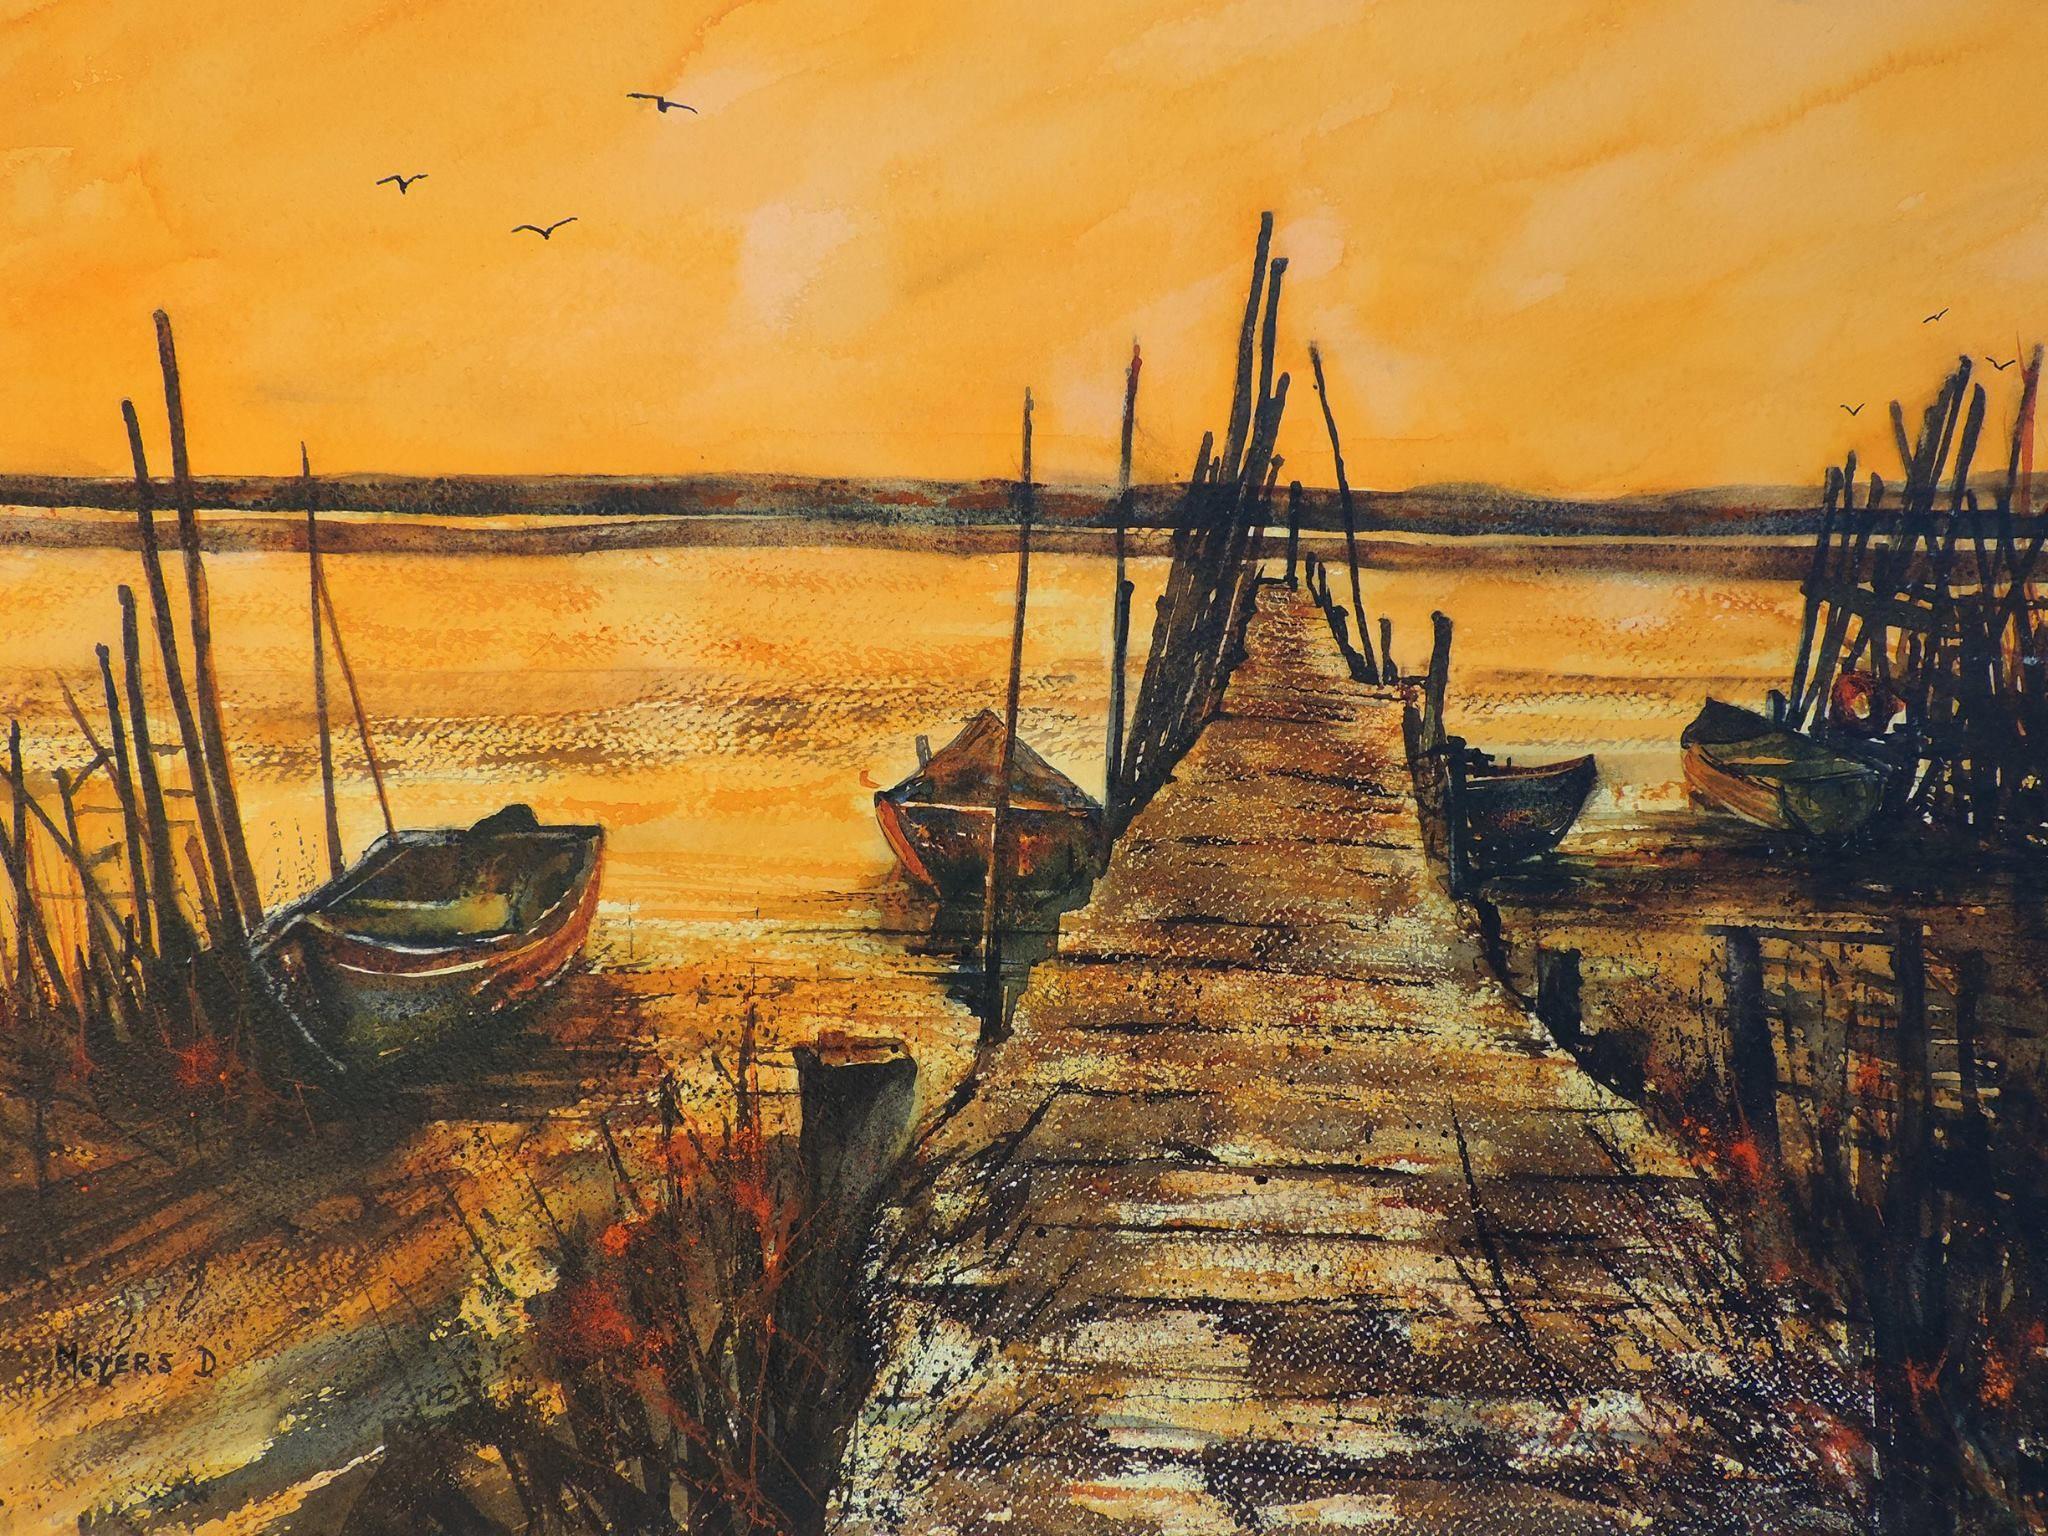 Watercolour Danny Meyers